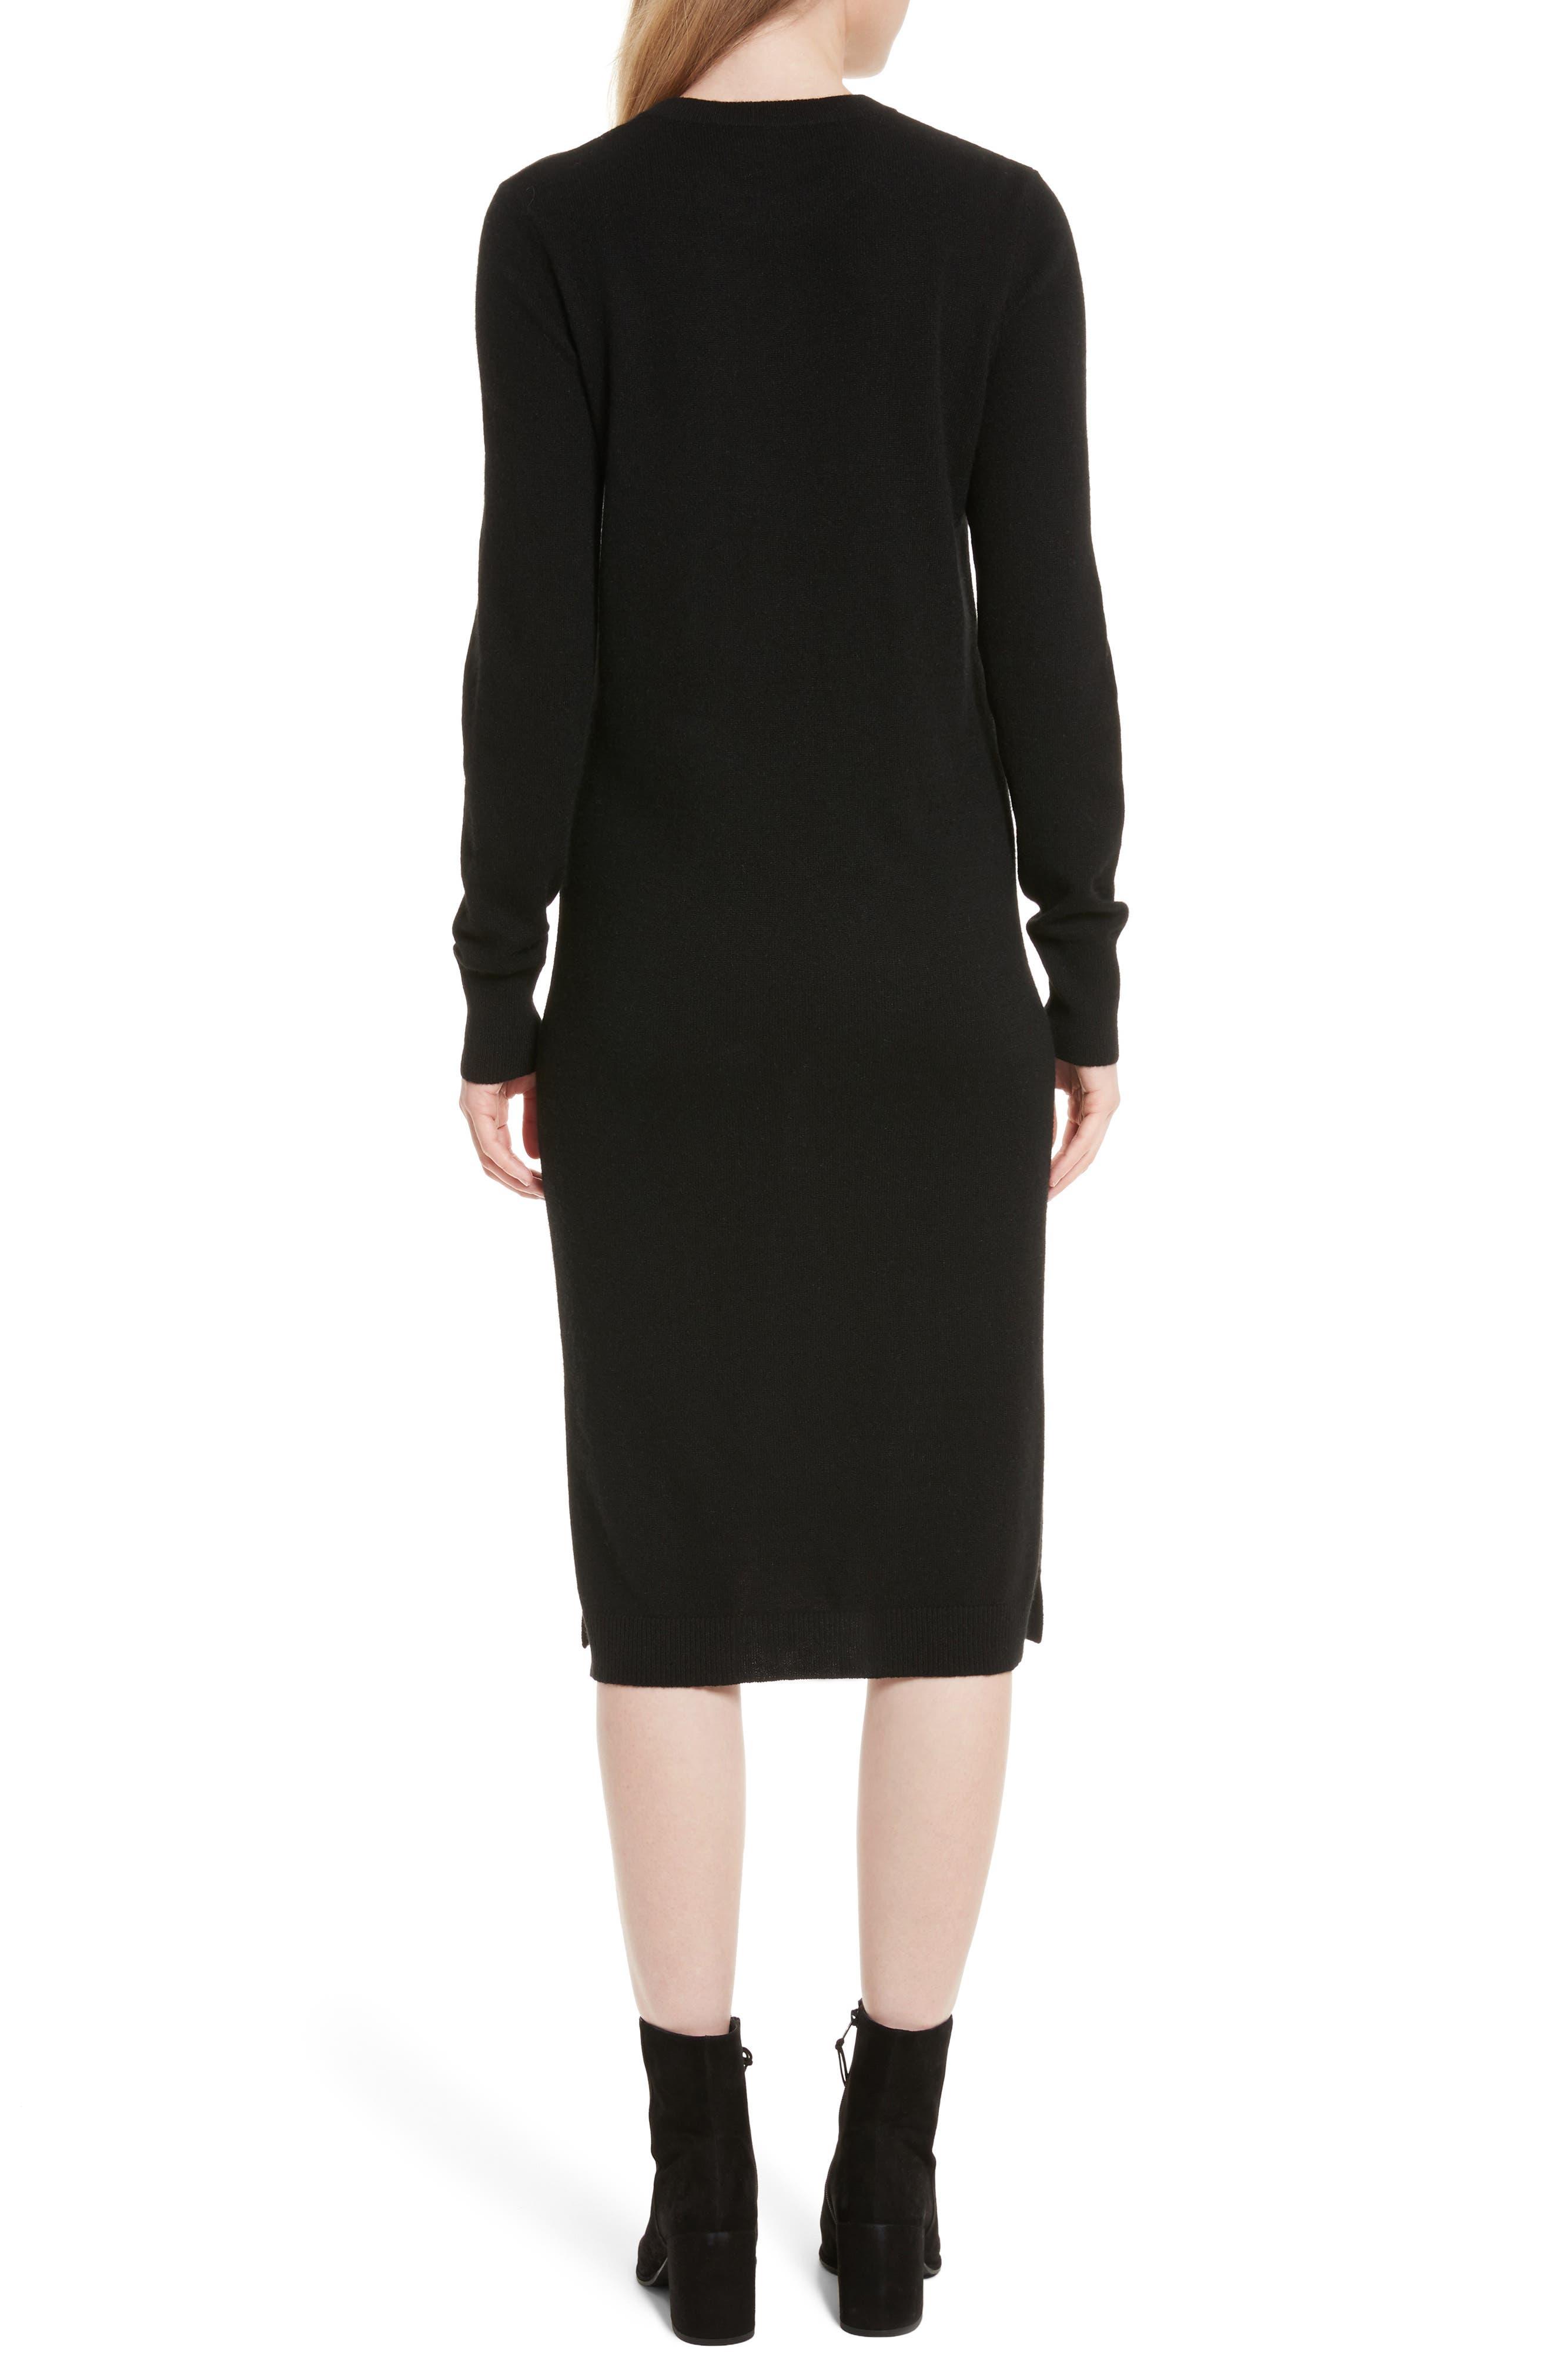 Snyder Cashmere Knit Midi Dress,                             Alternate thumbnail 2, color,                             001